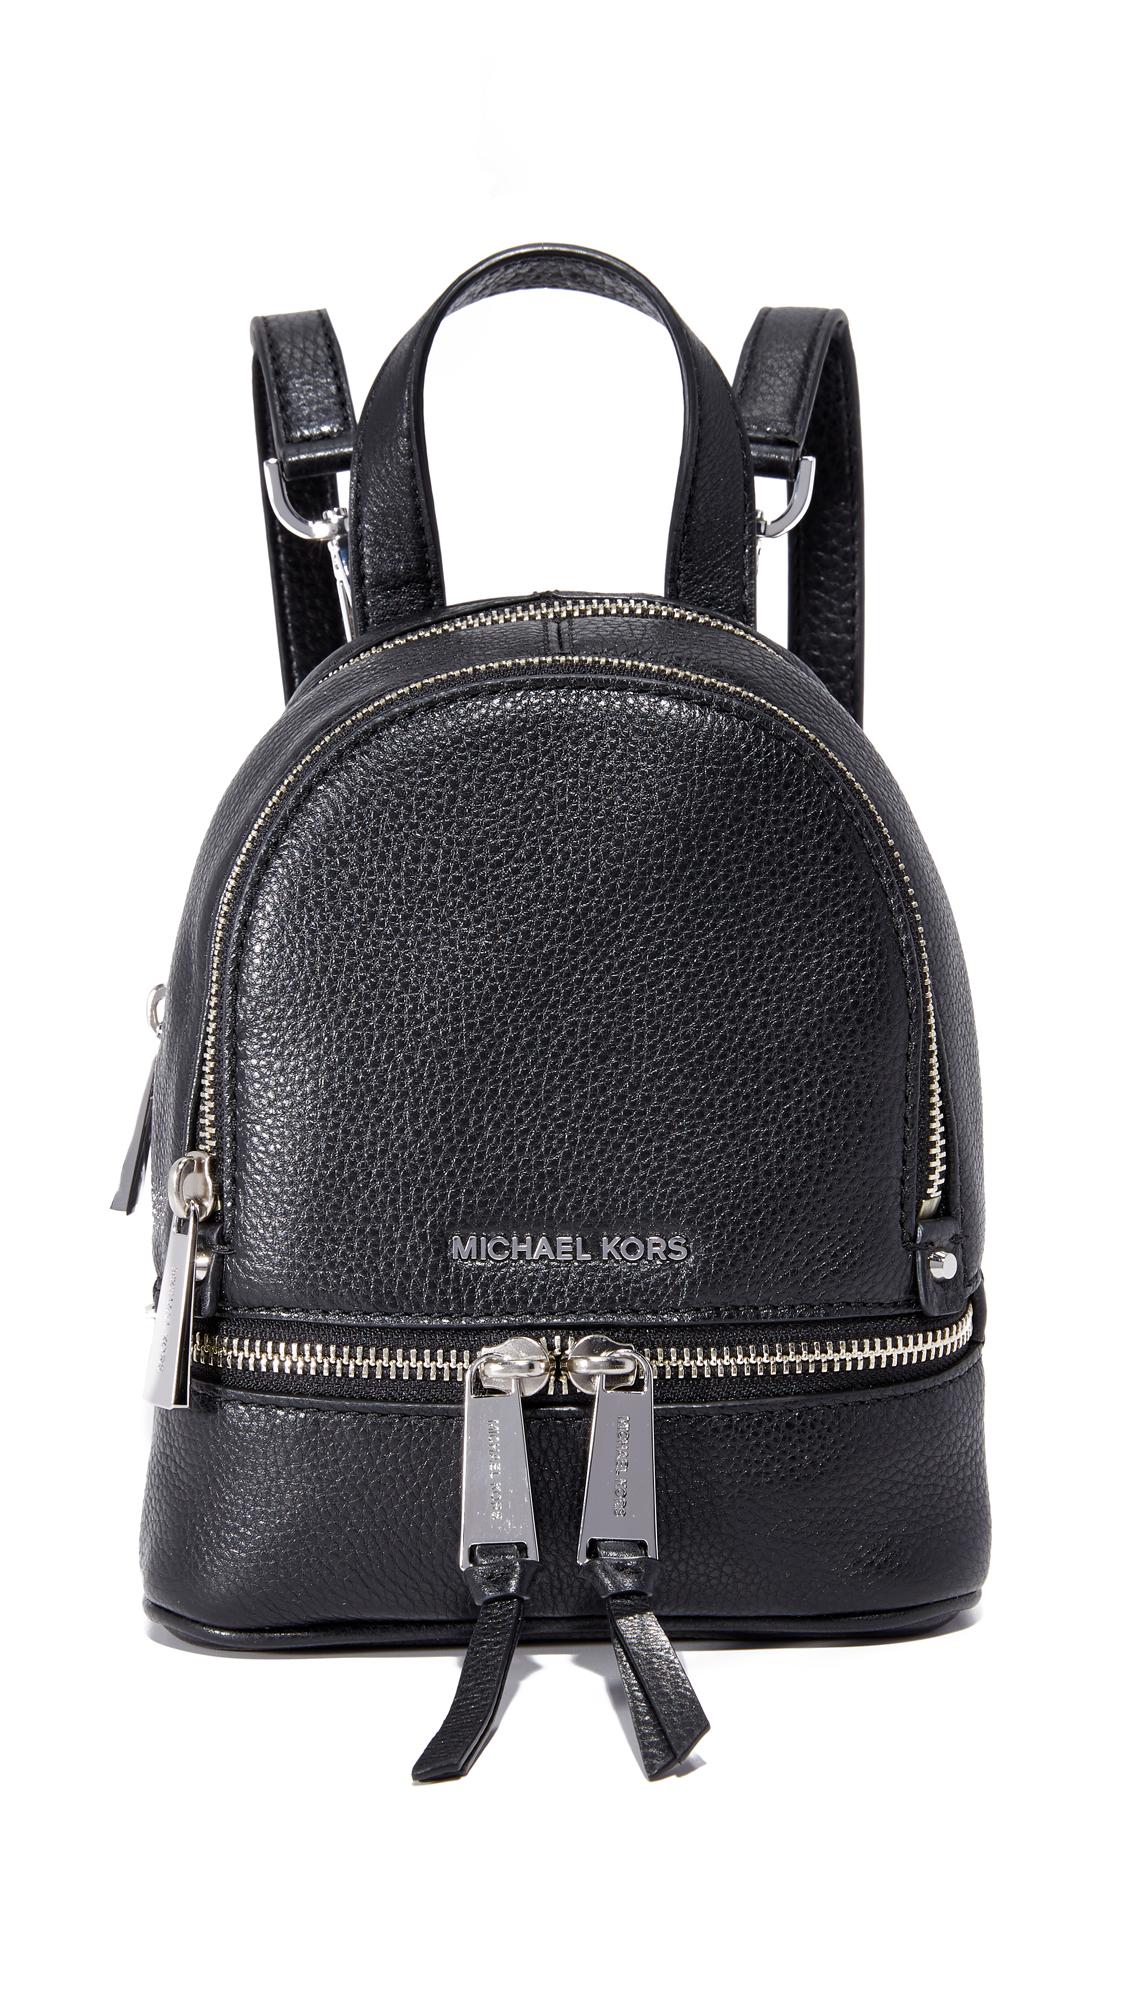 944dc746536ea6 Michael Kors Bags Mini Backpack | Stanford Center for Opportunity ...